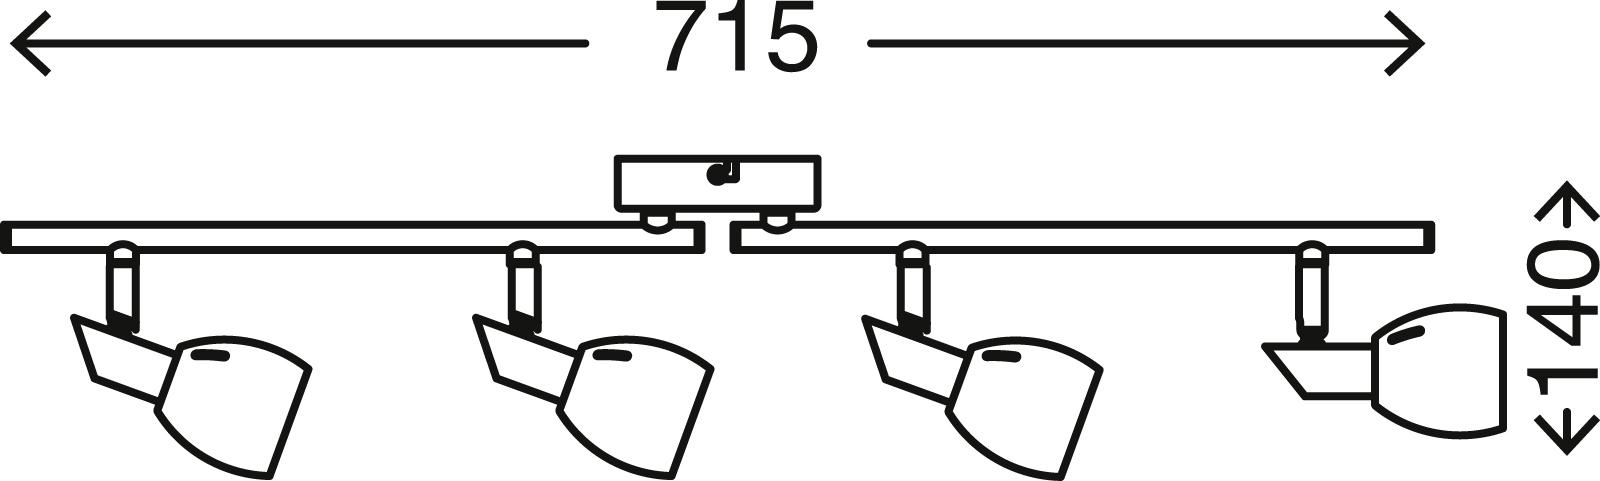 LED Spot Deckenleuchte, 71,5 cm, 20 W, Chrom-Weiß